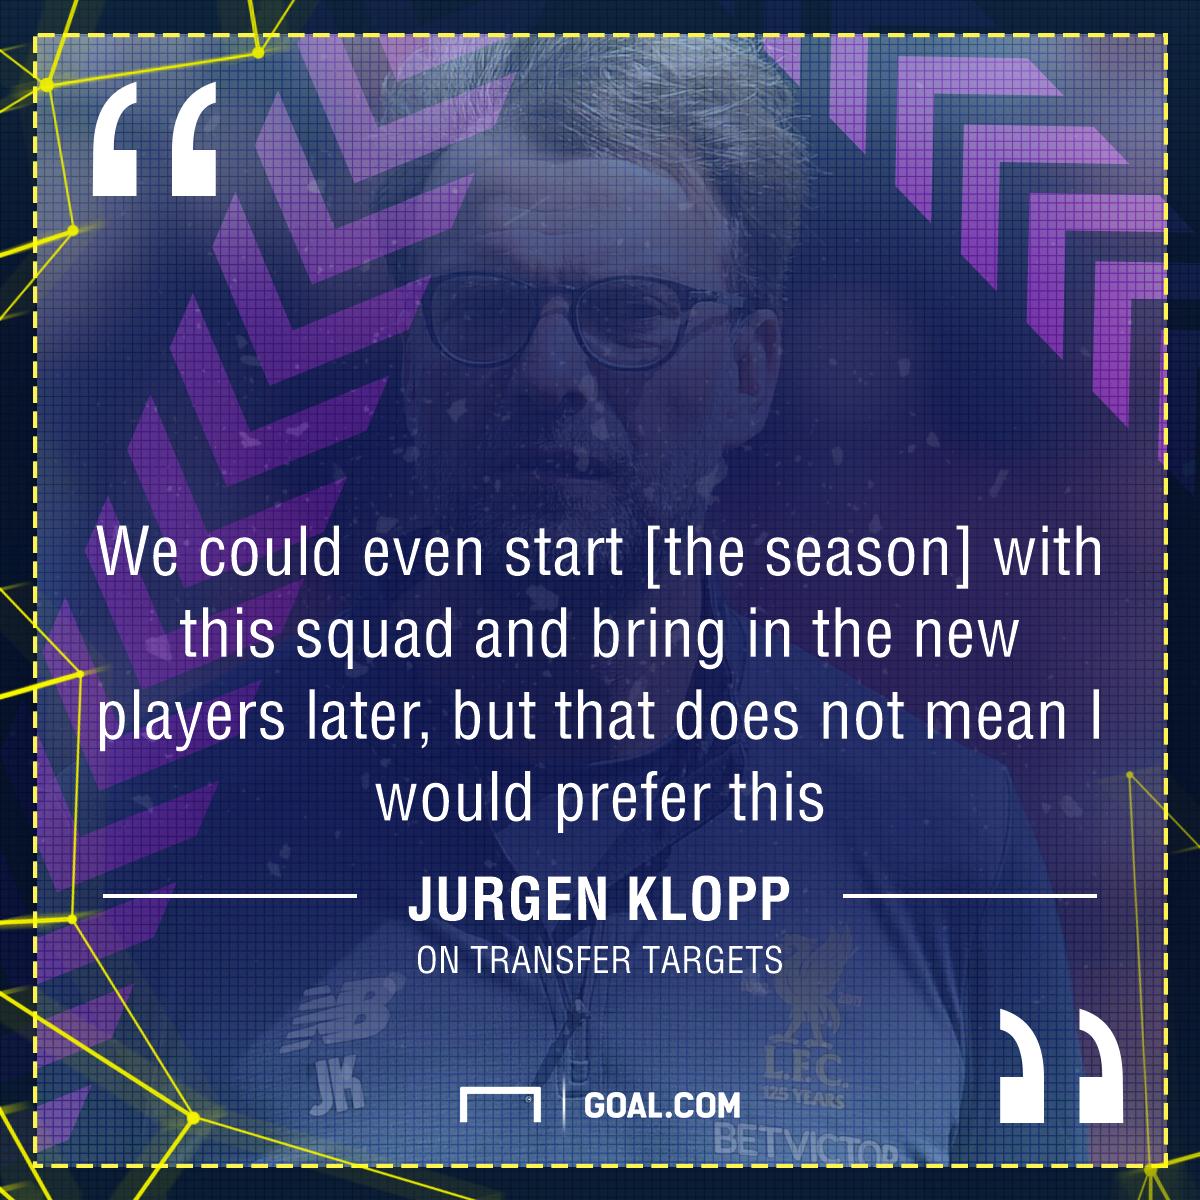 GFX Jurgen Klopp quote transfers